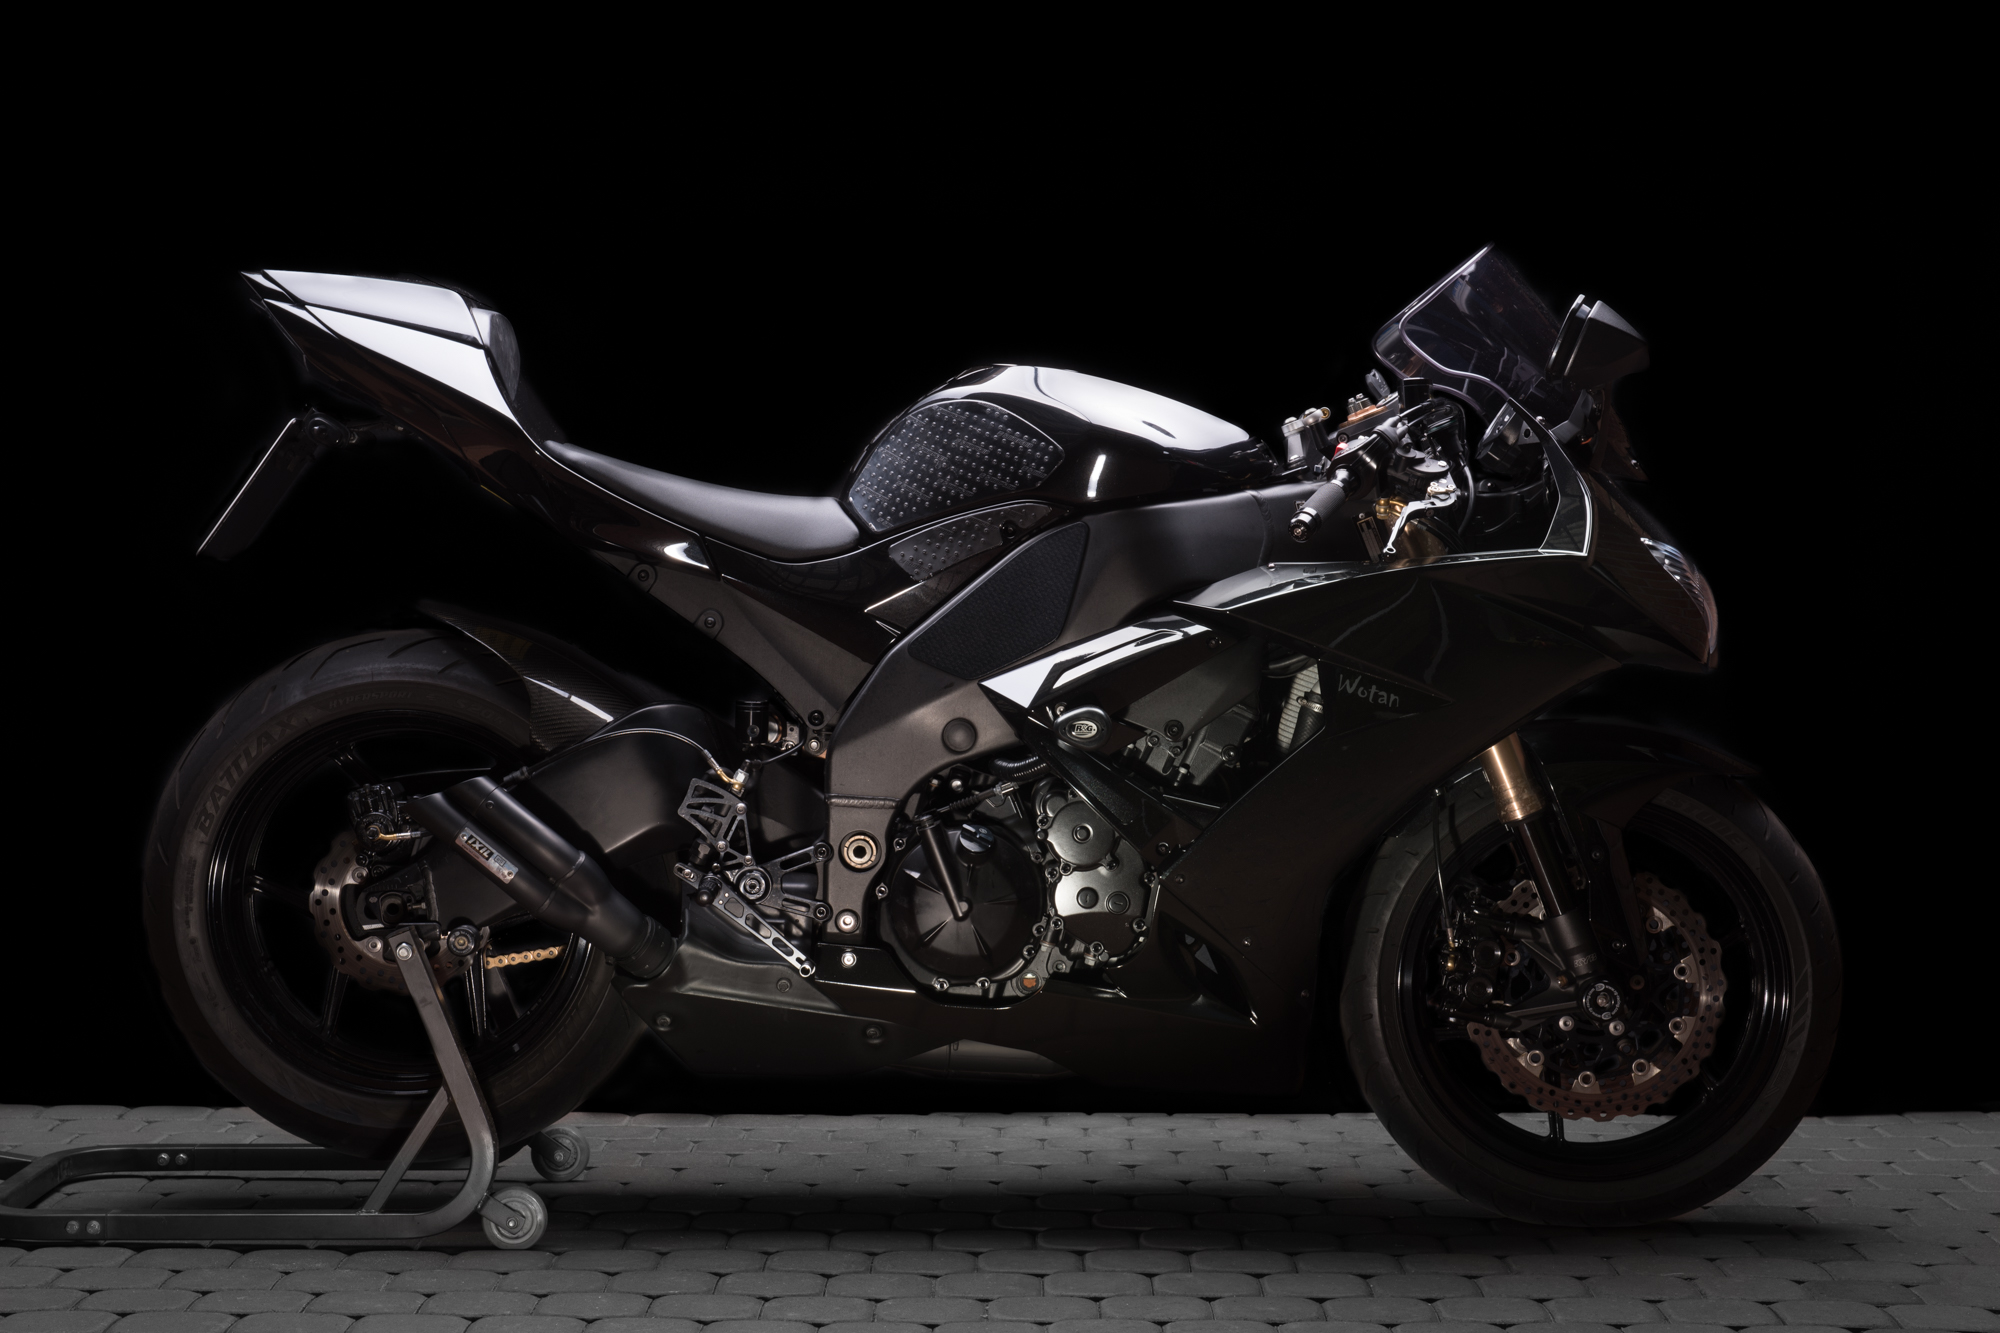 Studio Shoot, Part 3: Kawasaki ZX10R Ninja